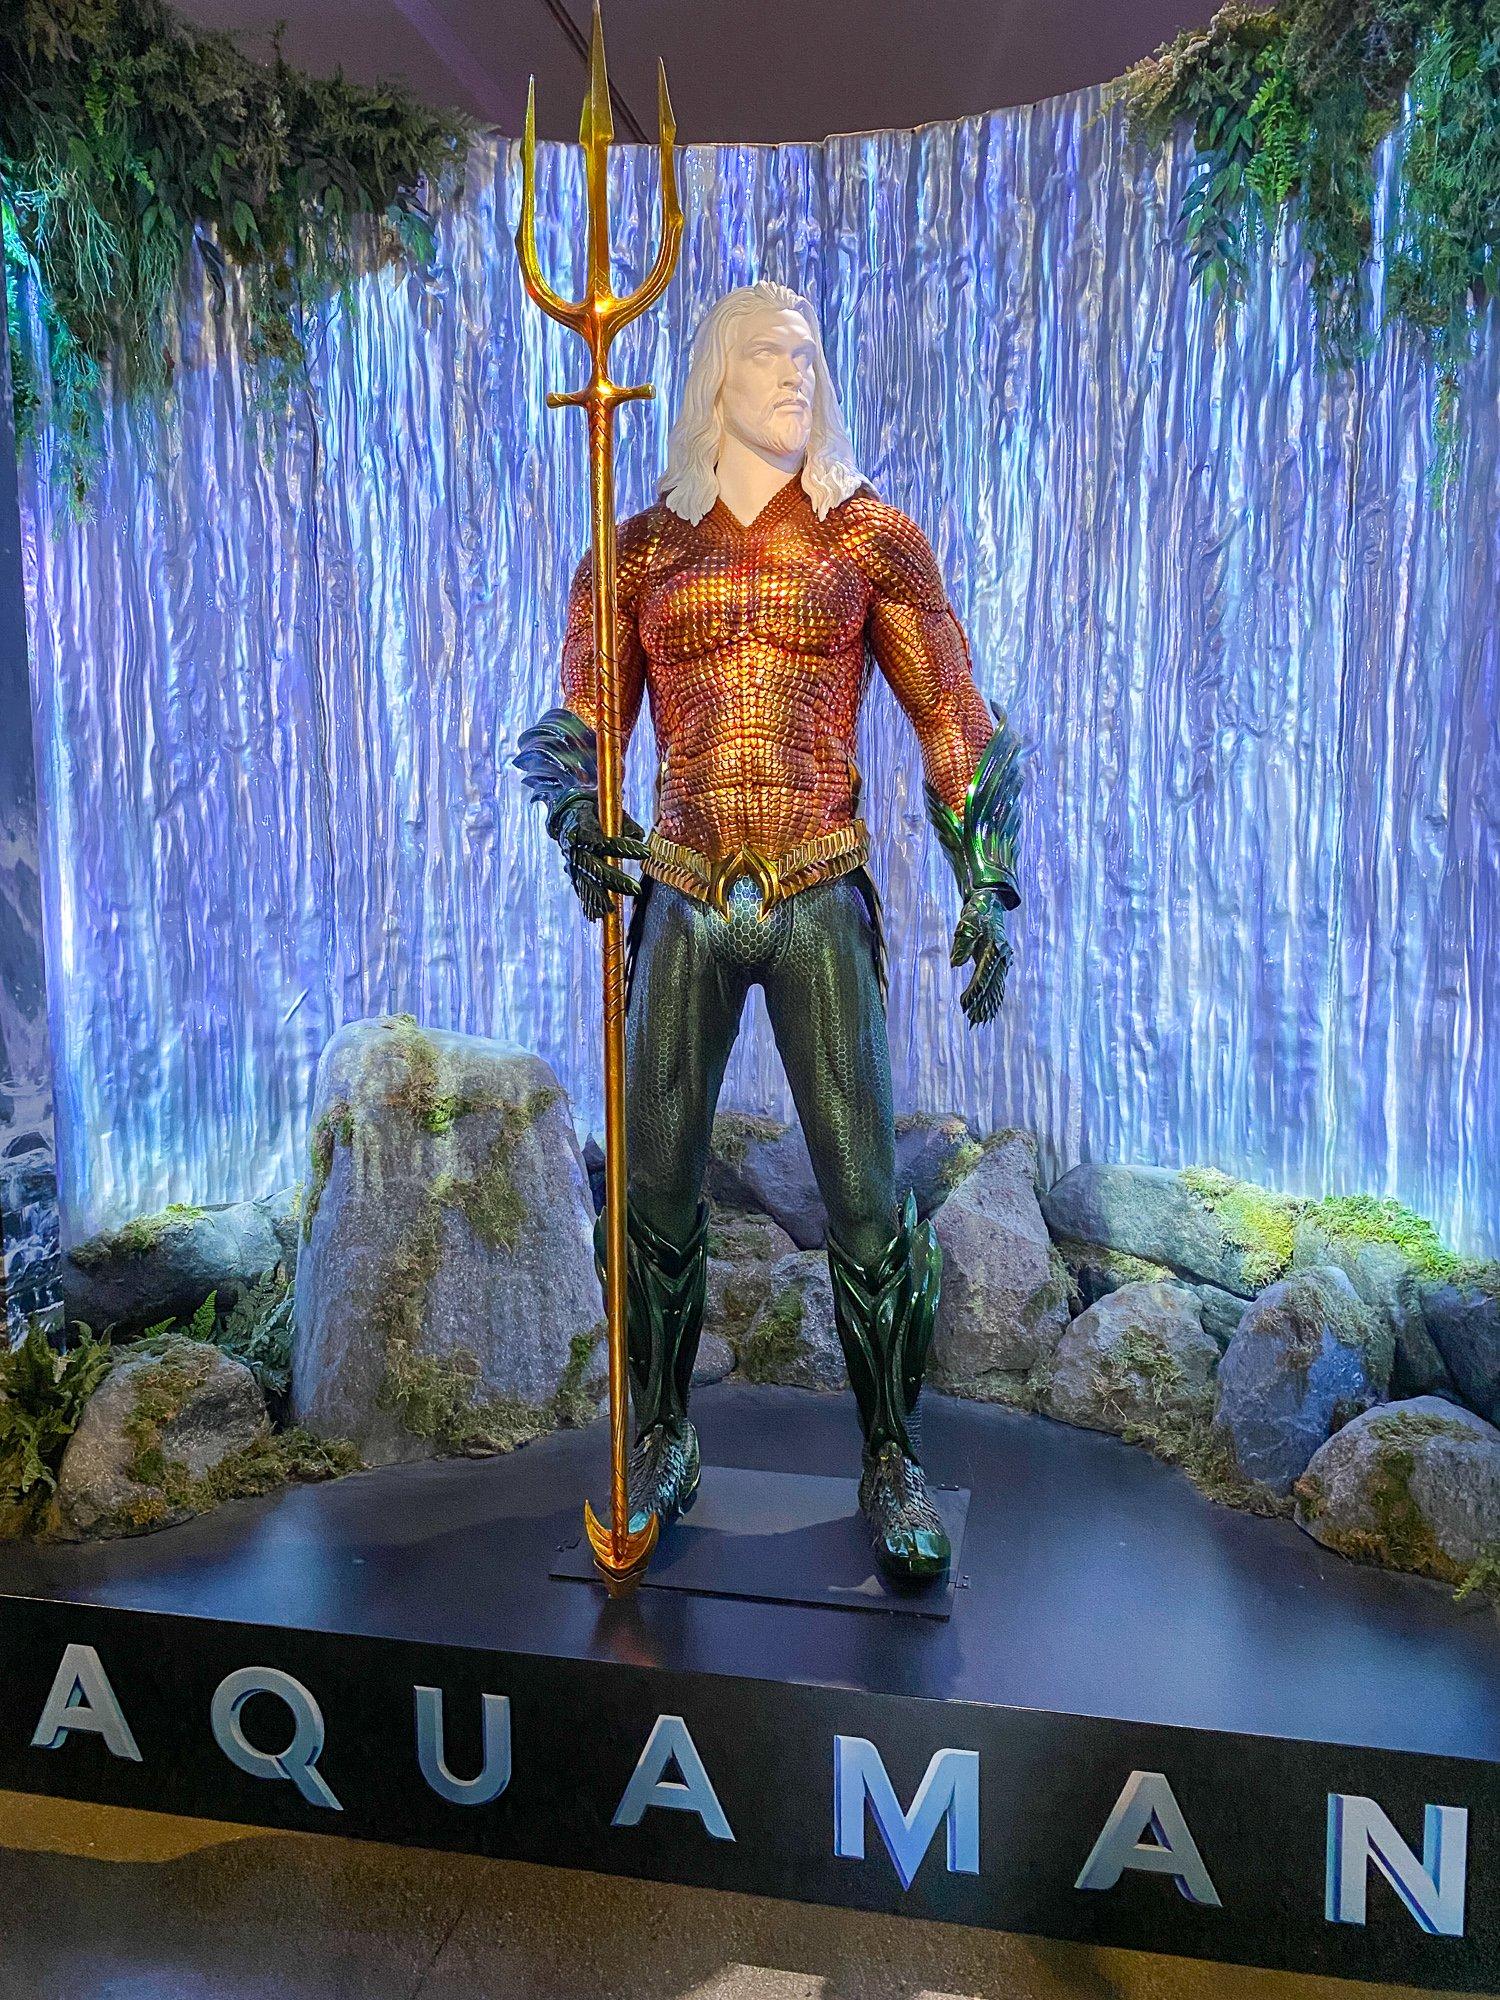 Jason Momoa's custom-made Aquaman costume at Warner Bros. Studio